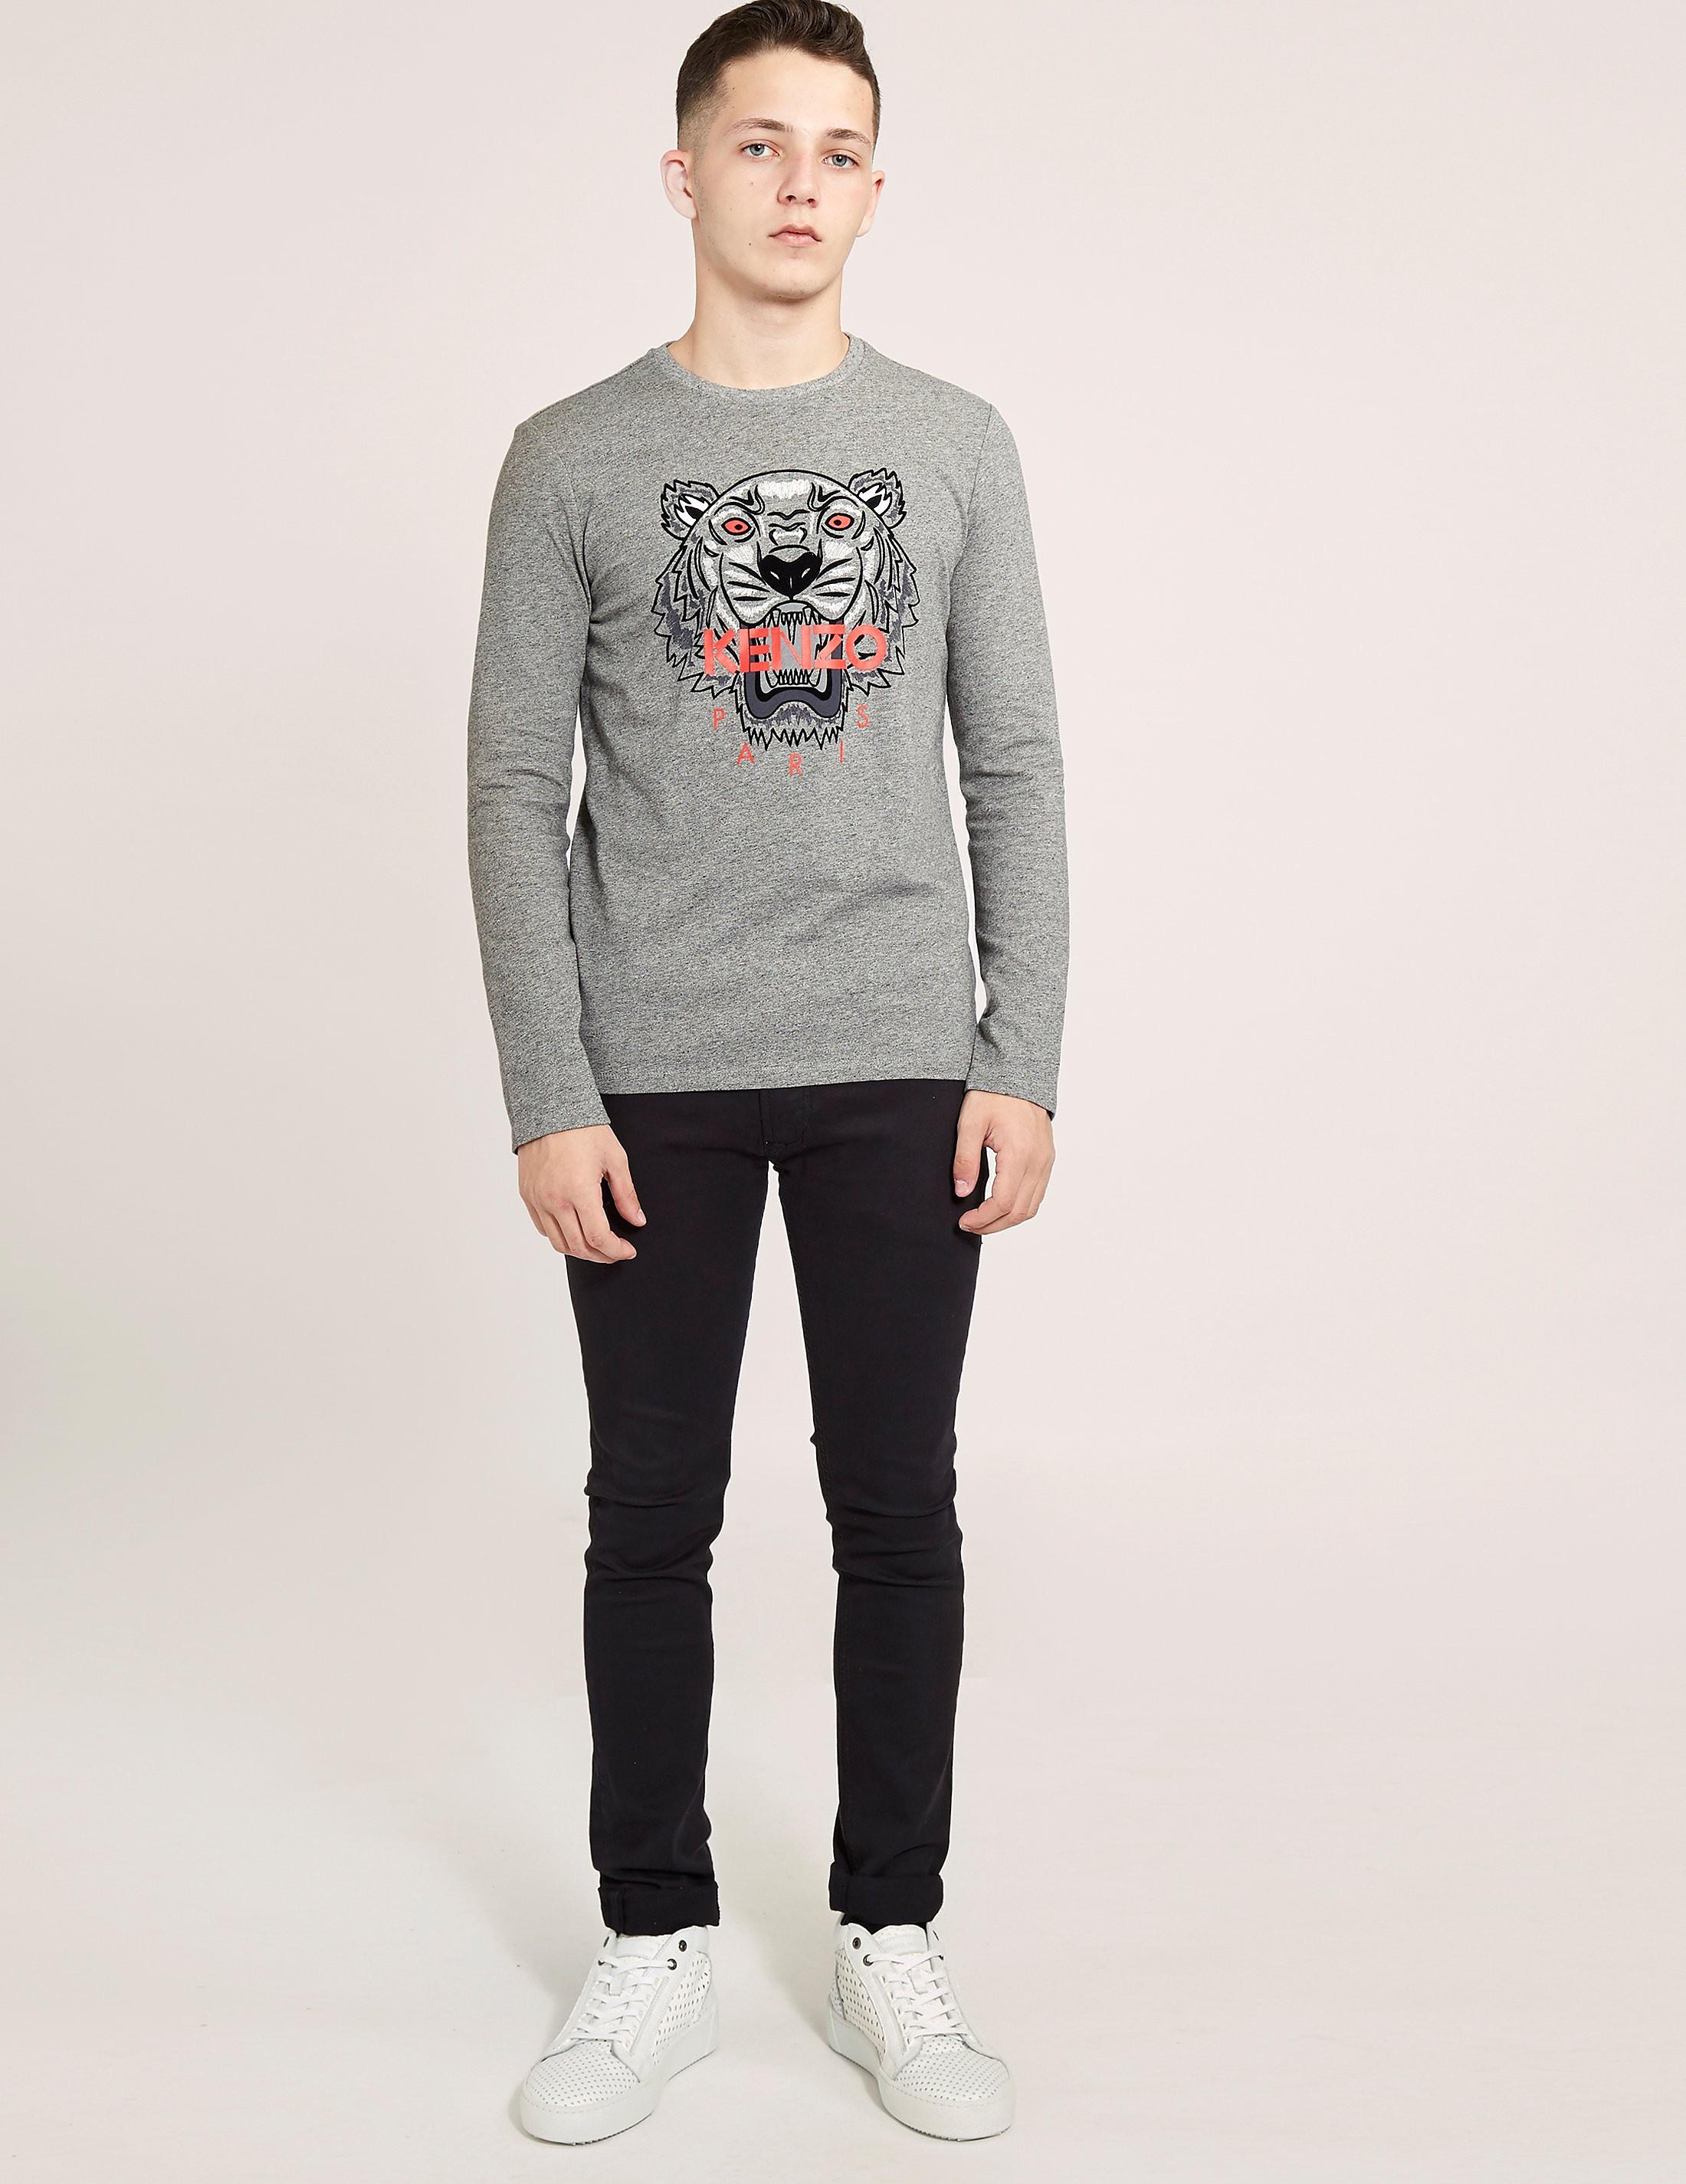 KENZO Tiger Emblem Long Sleeve T-Shirt